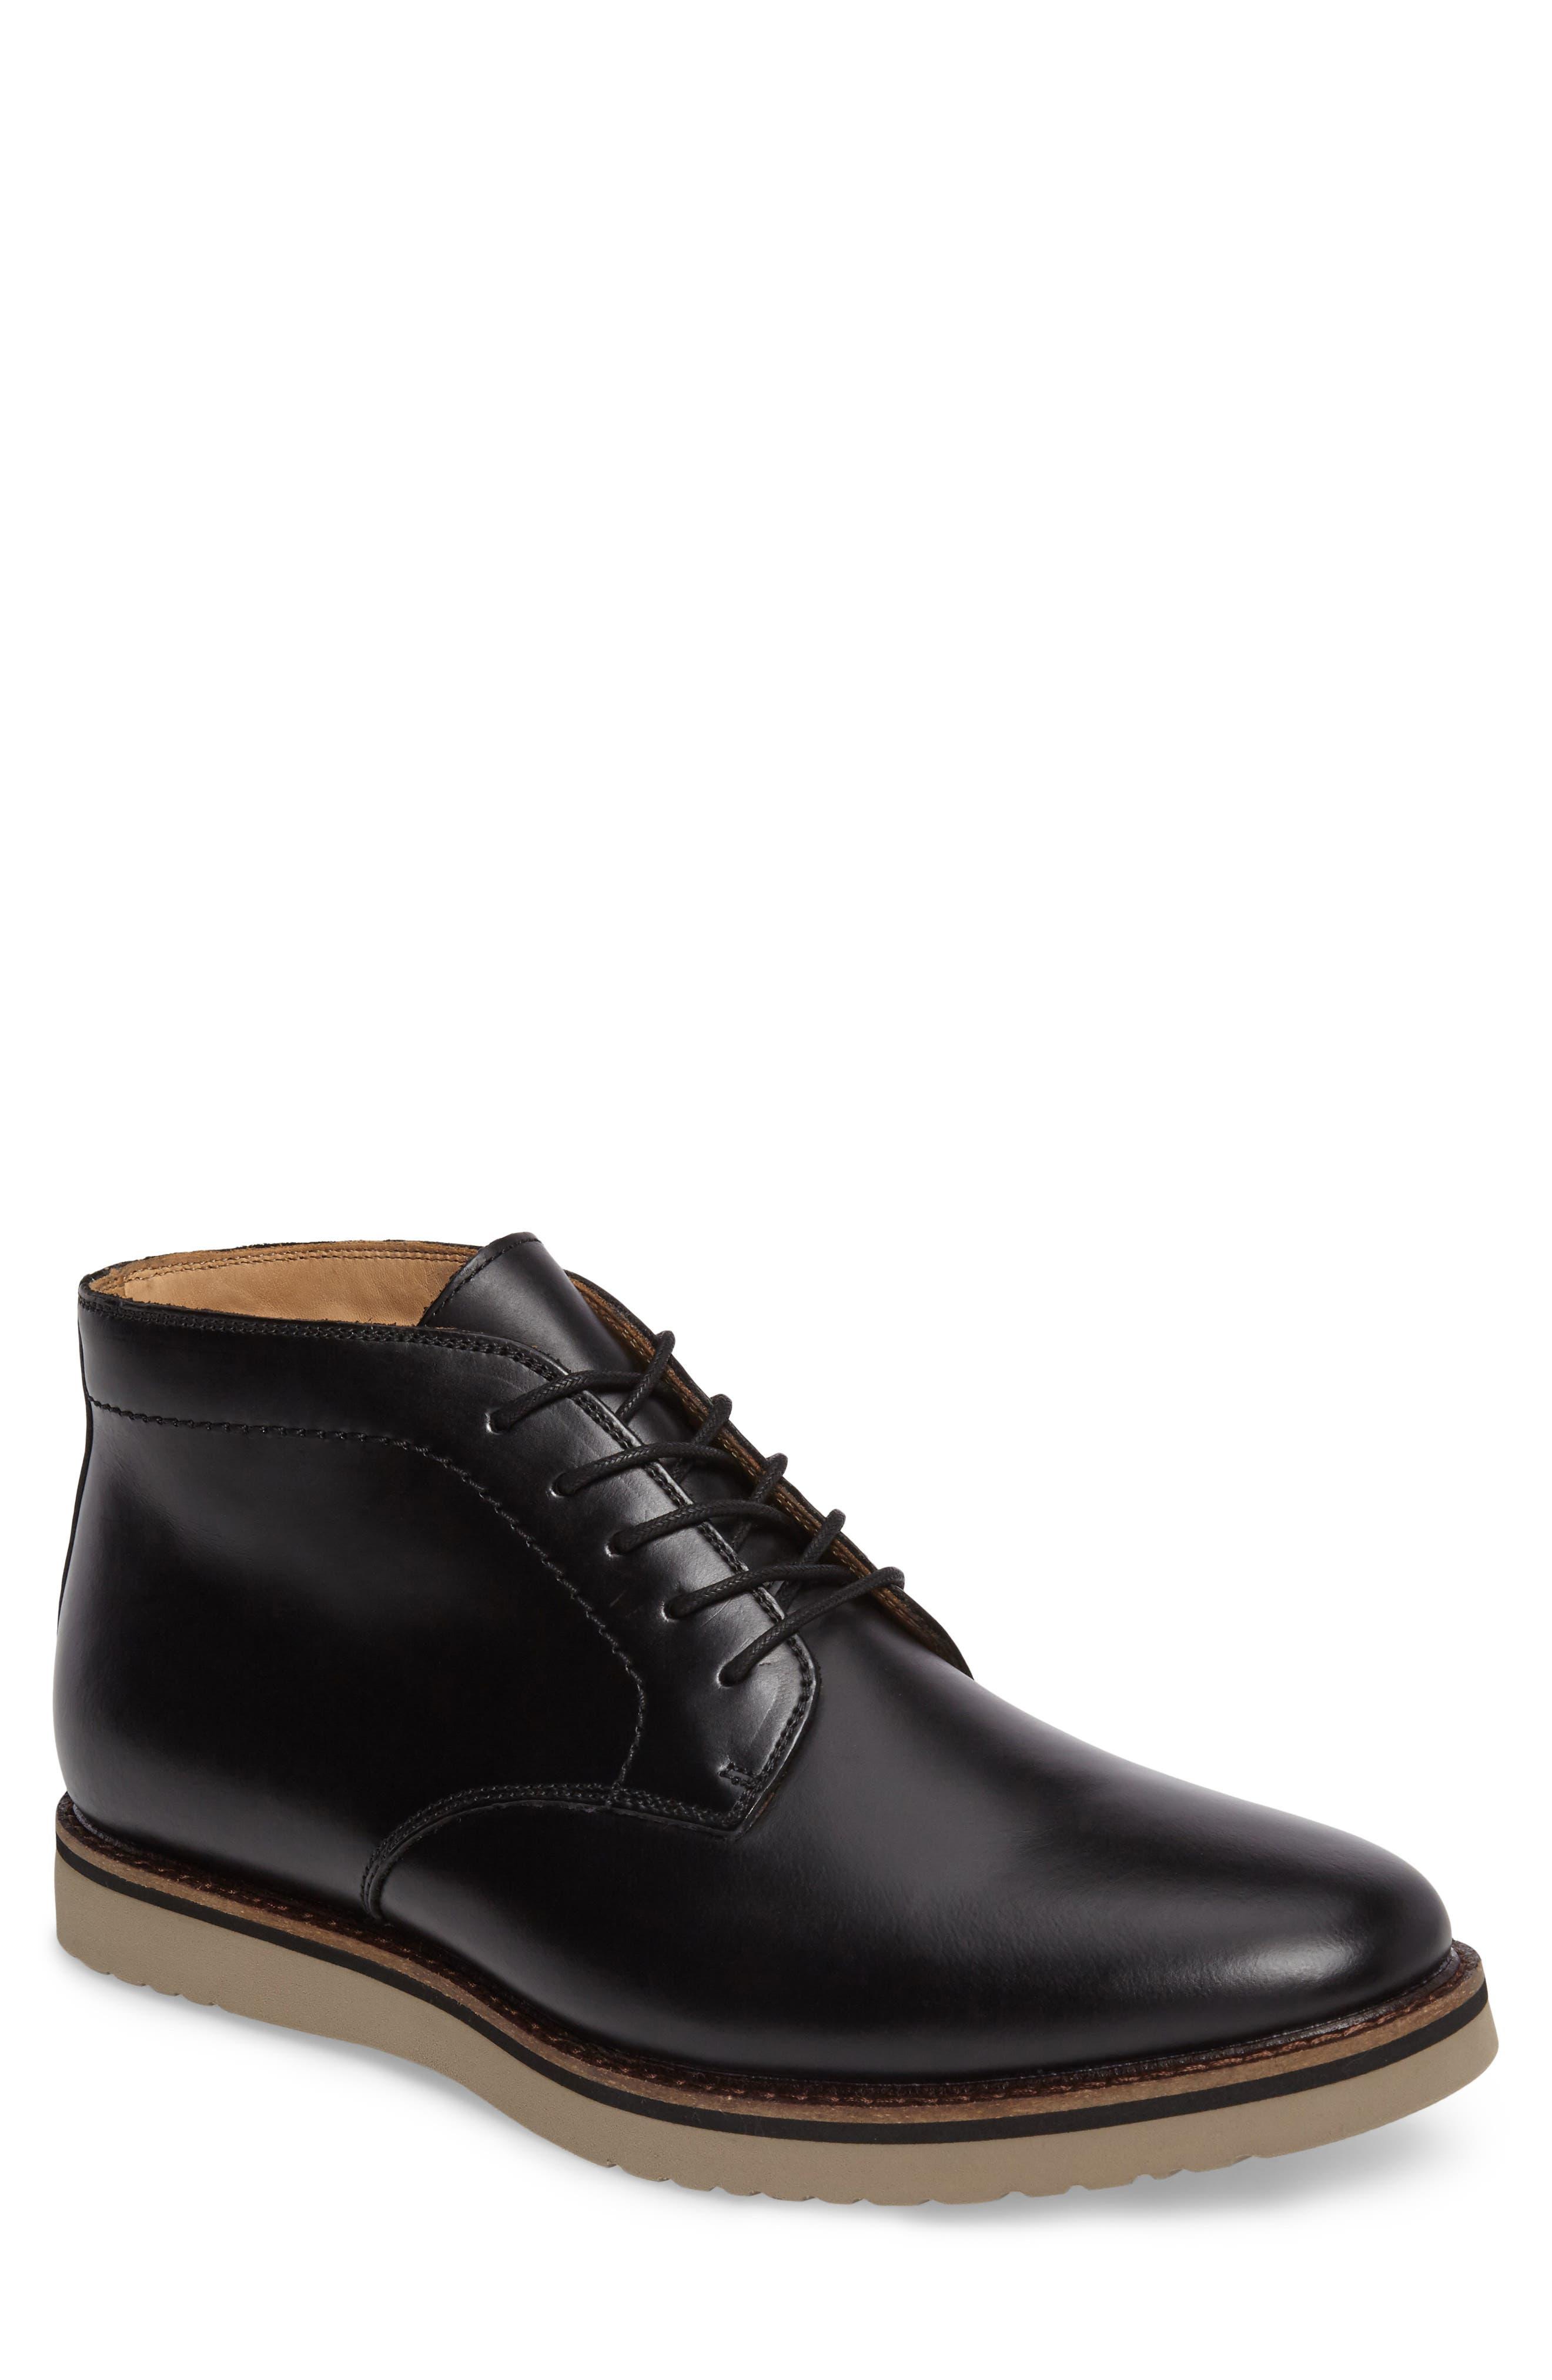 J SHOES 'Farley' Chukka Boot (Men)